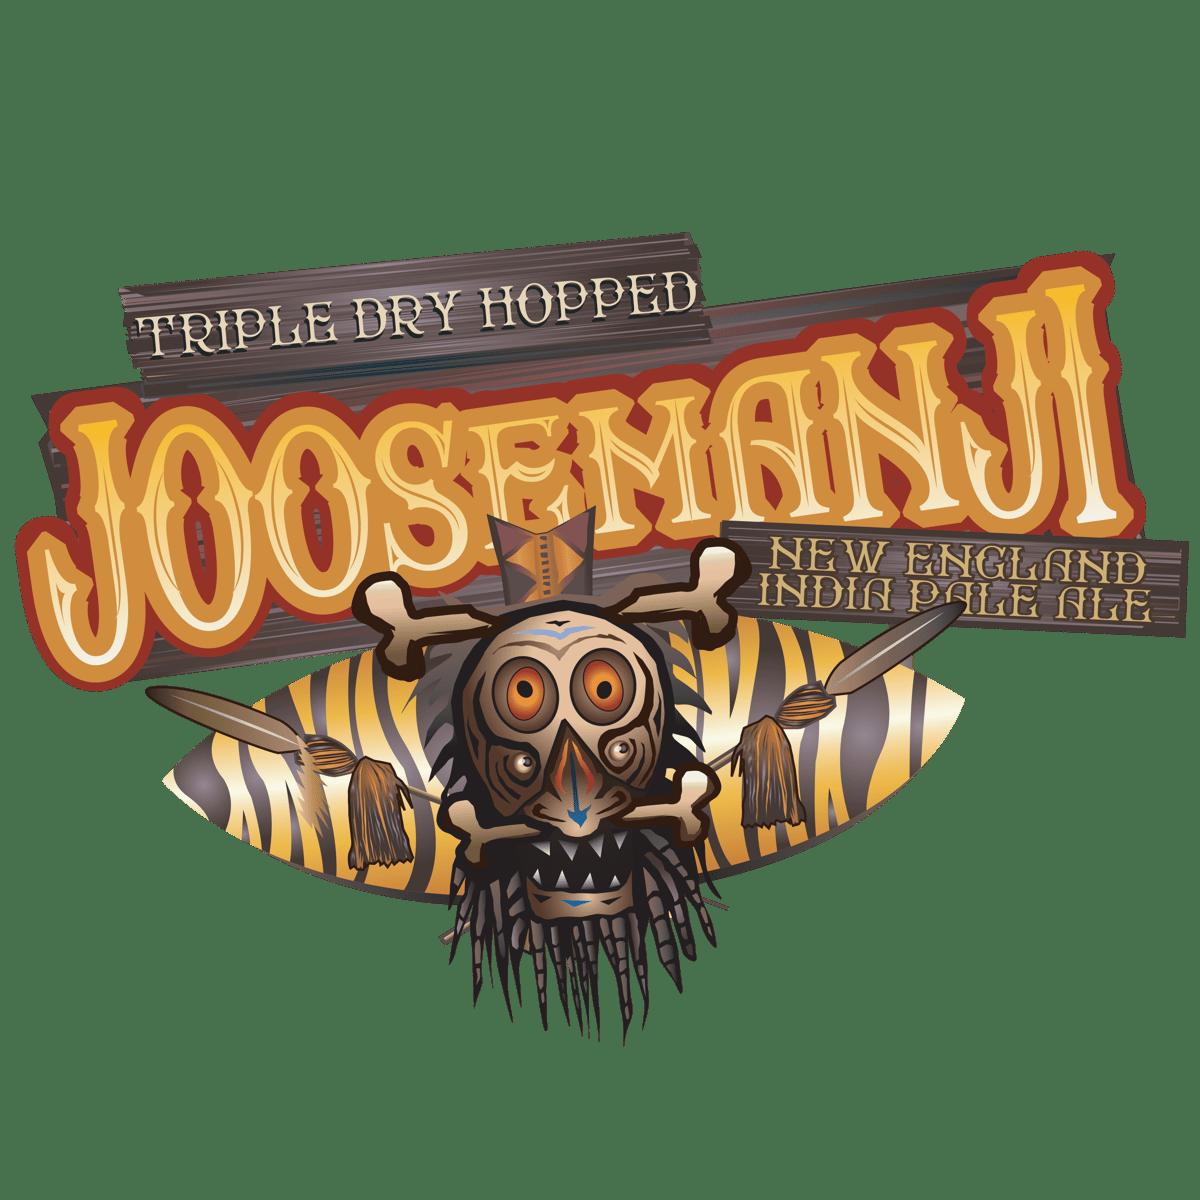 Triple Dry Hopped Joosemanji